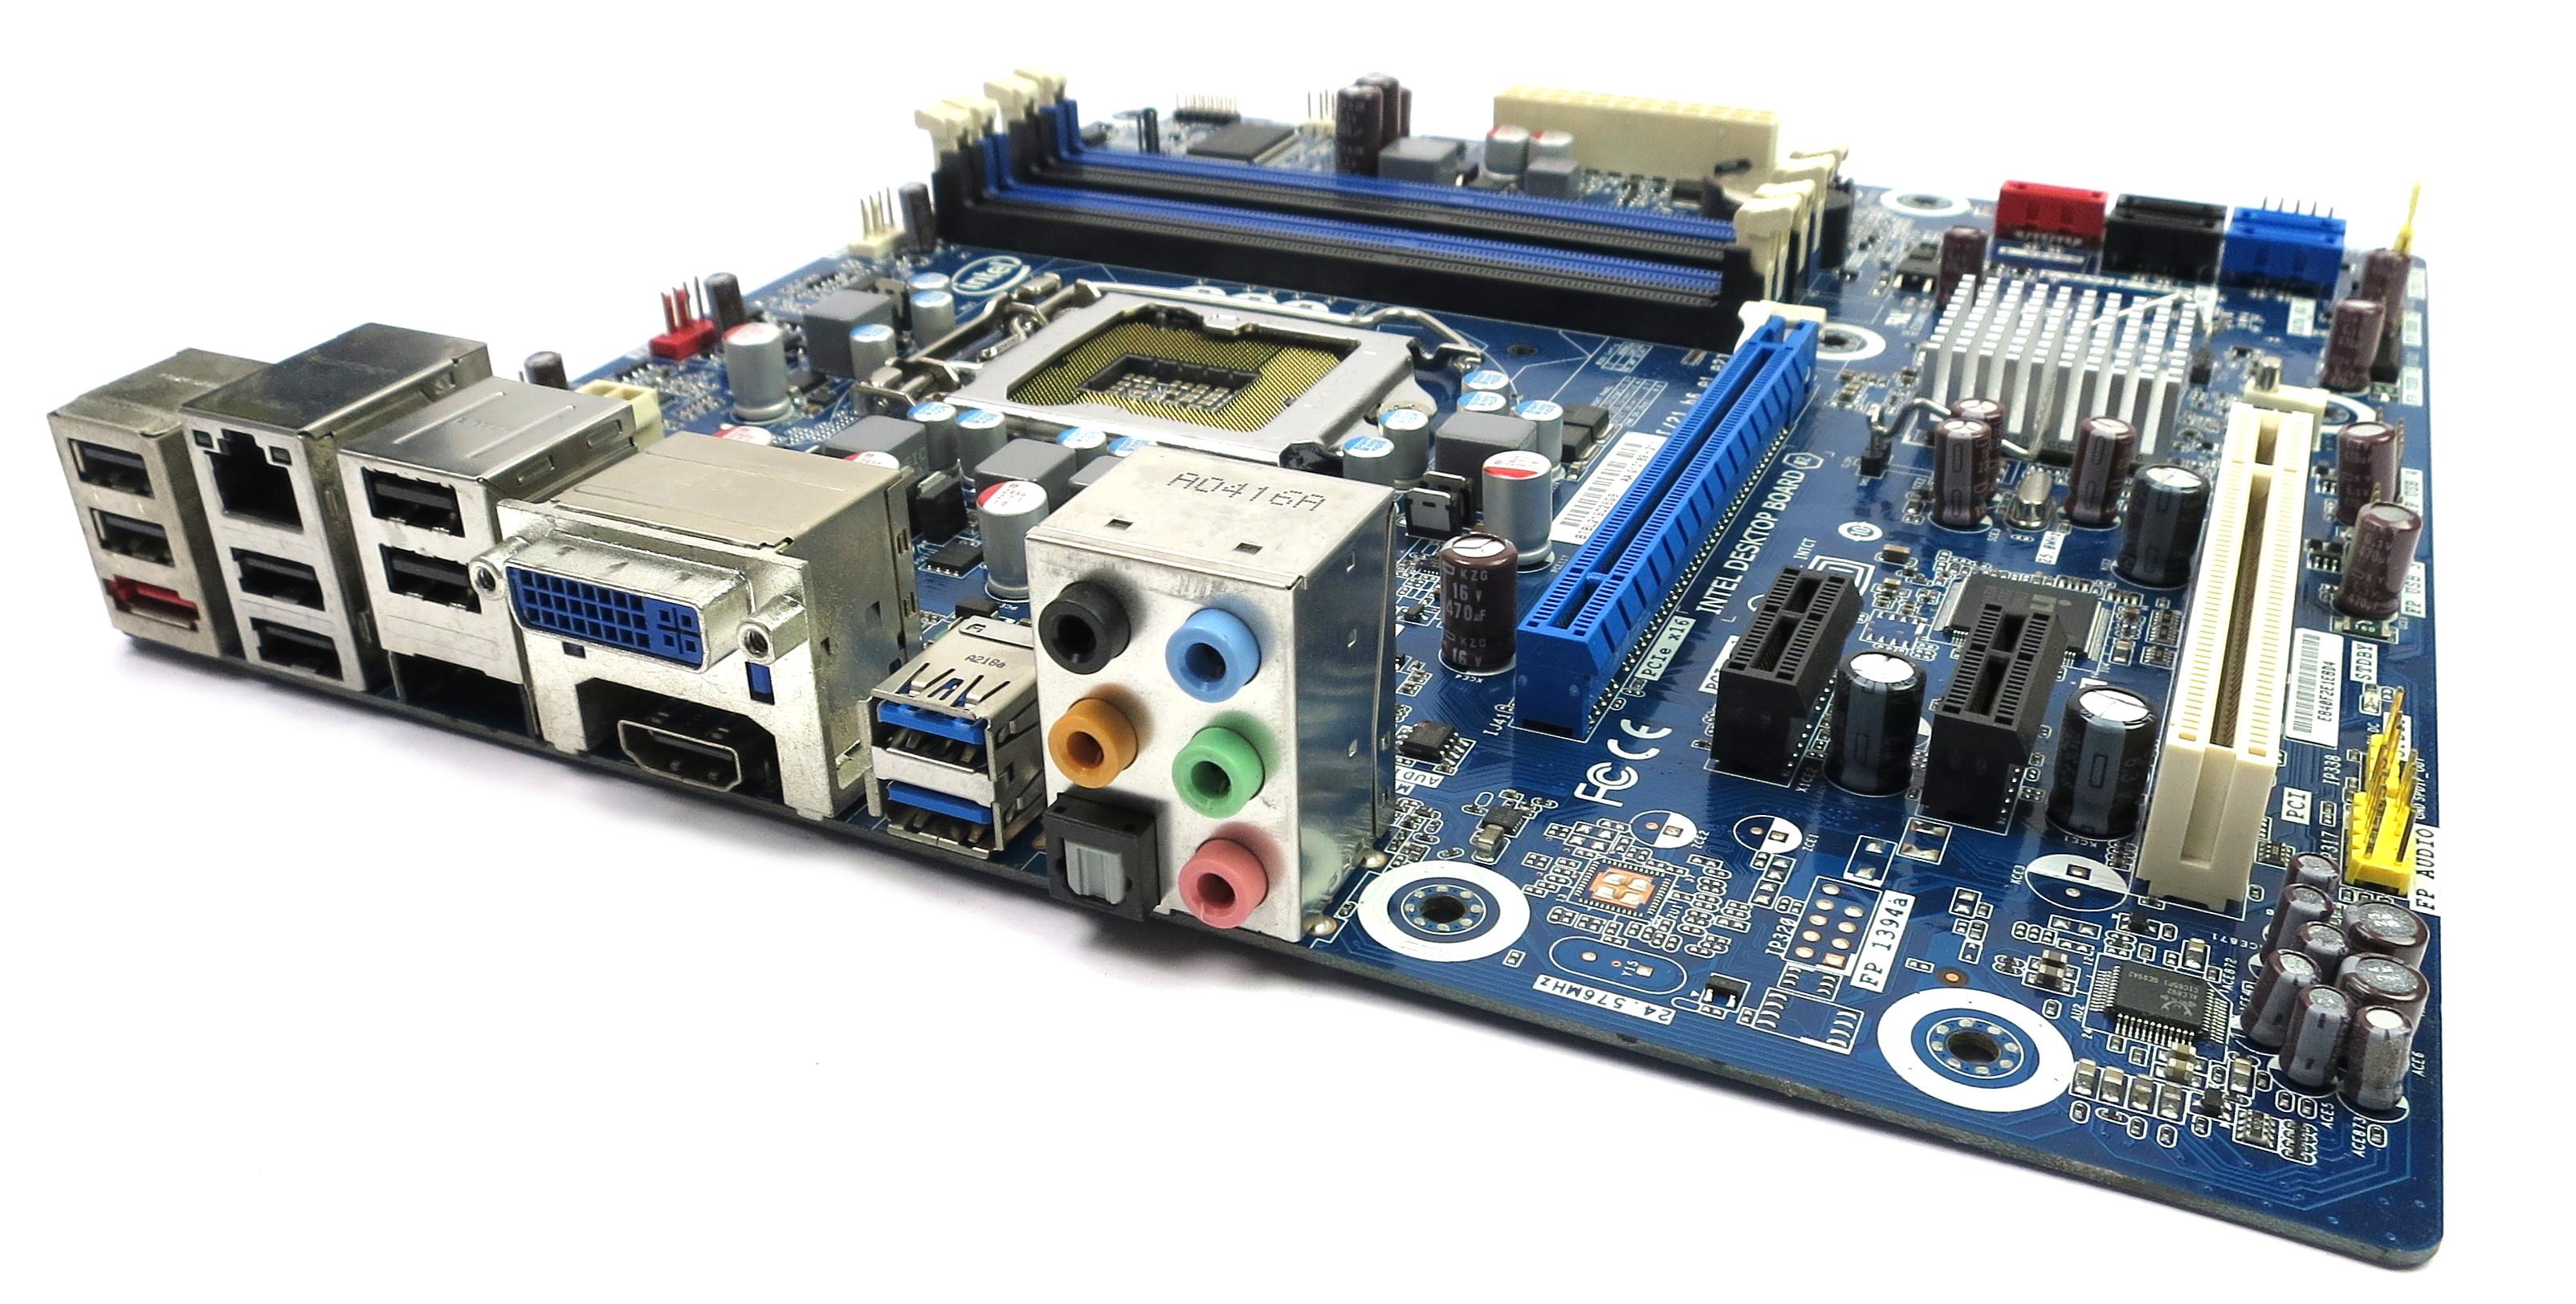 Intel G10189-211 DH67BL Micro ATX LGA1155 USB 3.0 Desktop Motherboard - StonePC